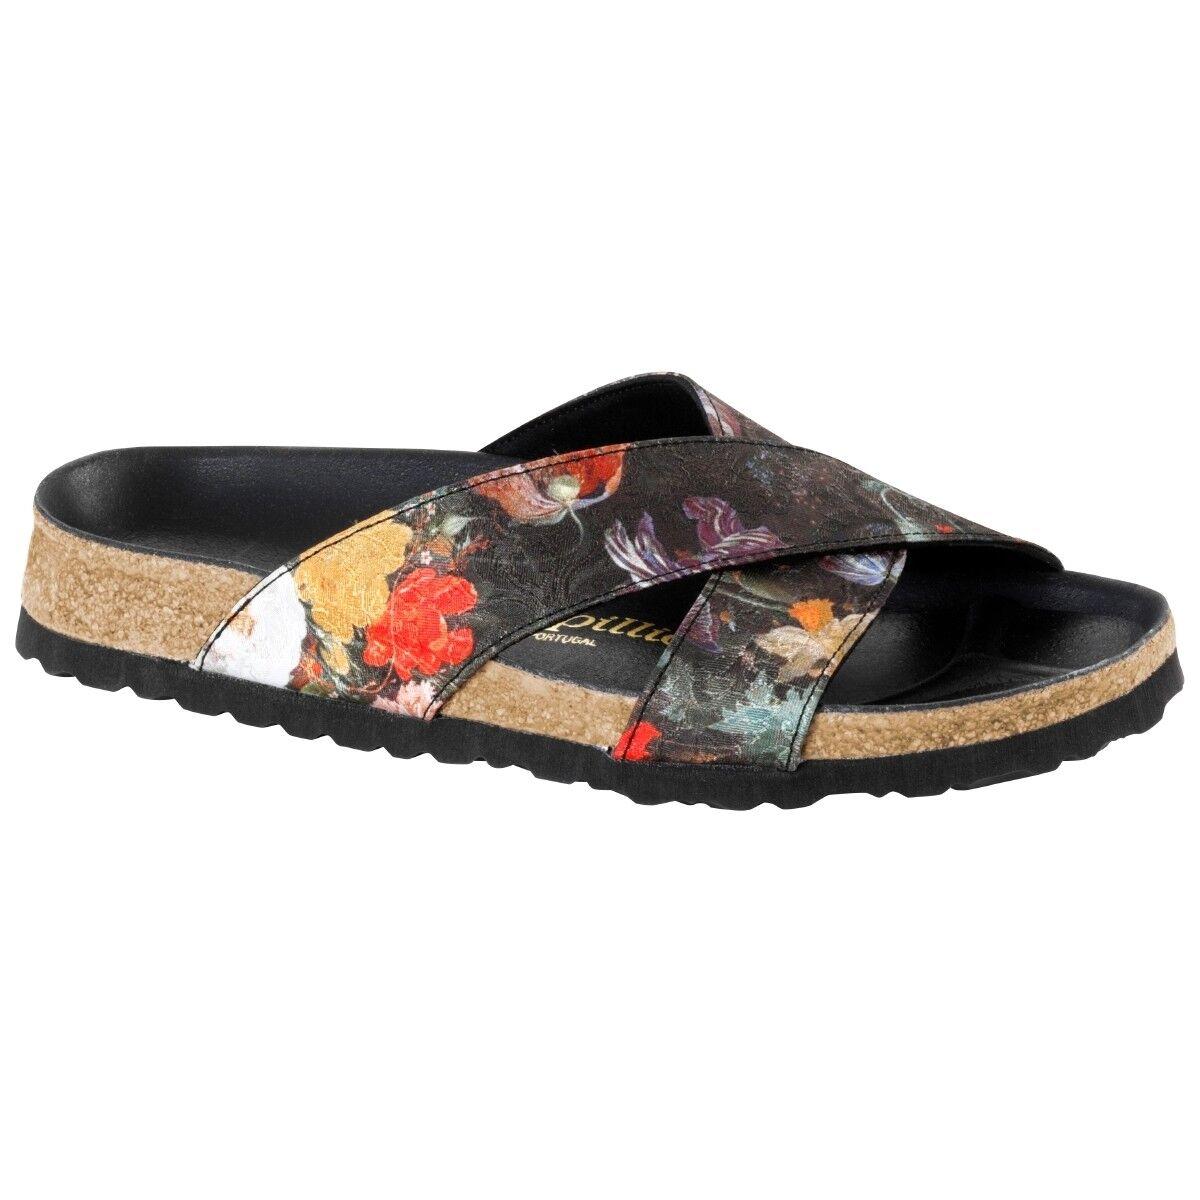 Sandalia textil de Birkenstock Papillio Daytona zapatos floral 1007098 ancho estrecho